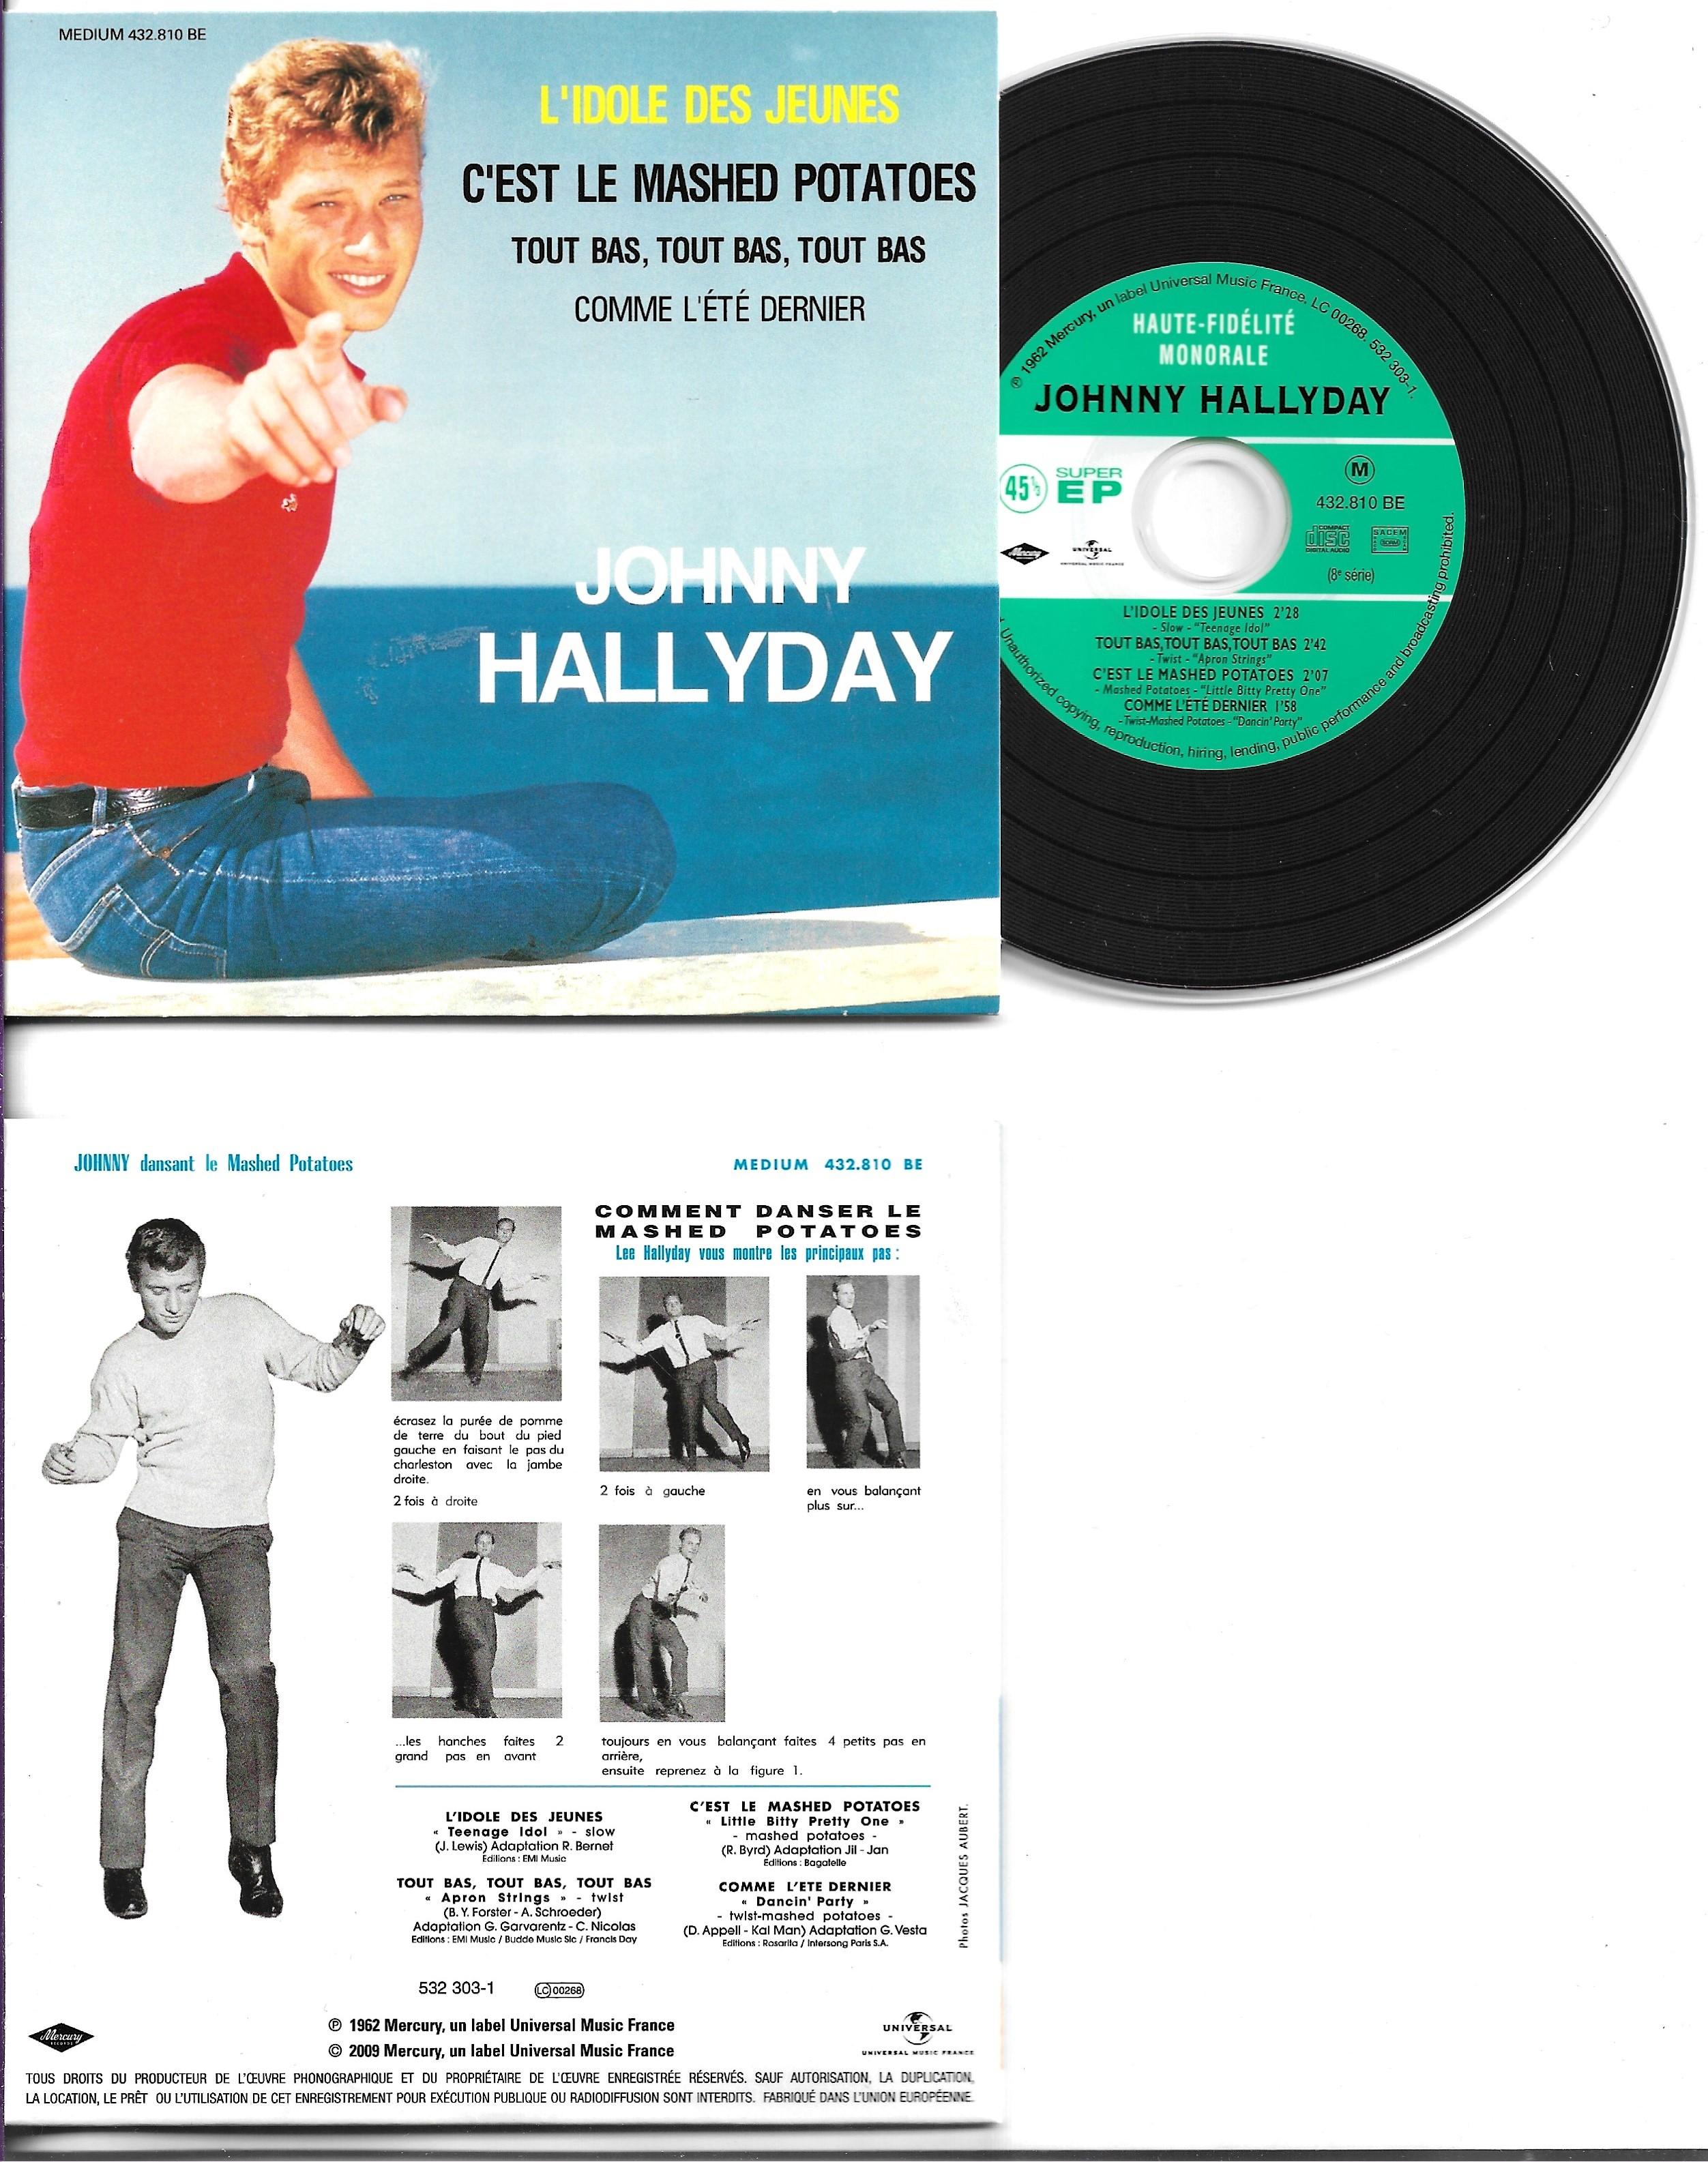 JOHNNY HALLYDAY - L'idole des jeunes EP REPLICA 4-track CARD SLEEVE - CD single